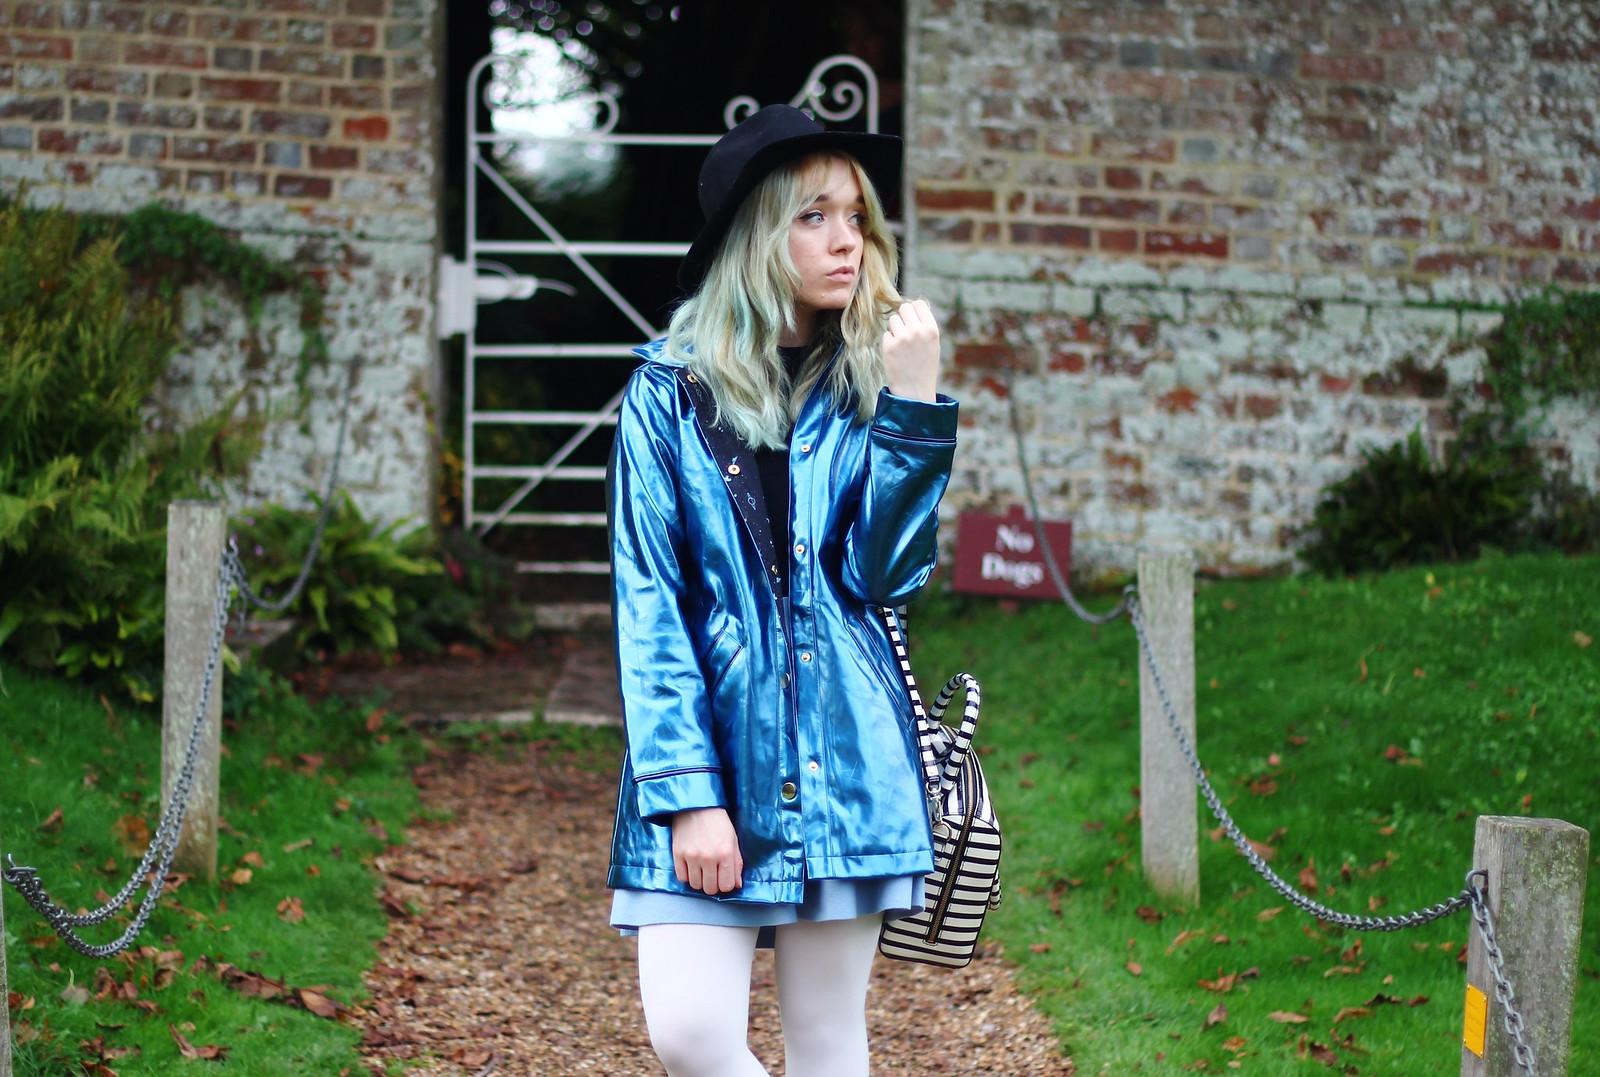 3_yumi_space_mac, space_grunge, style, pastel_hair, blogger